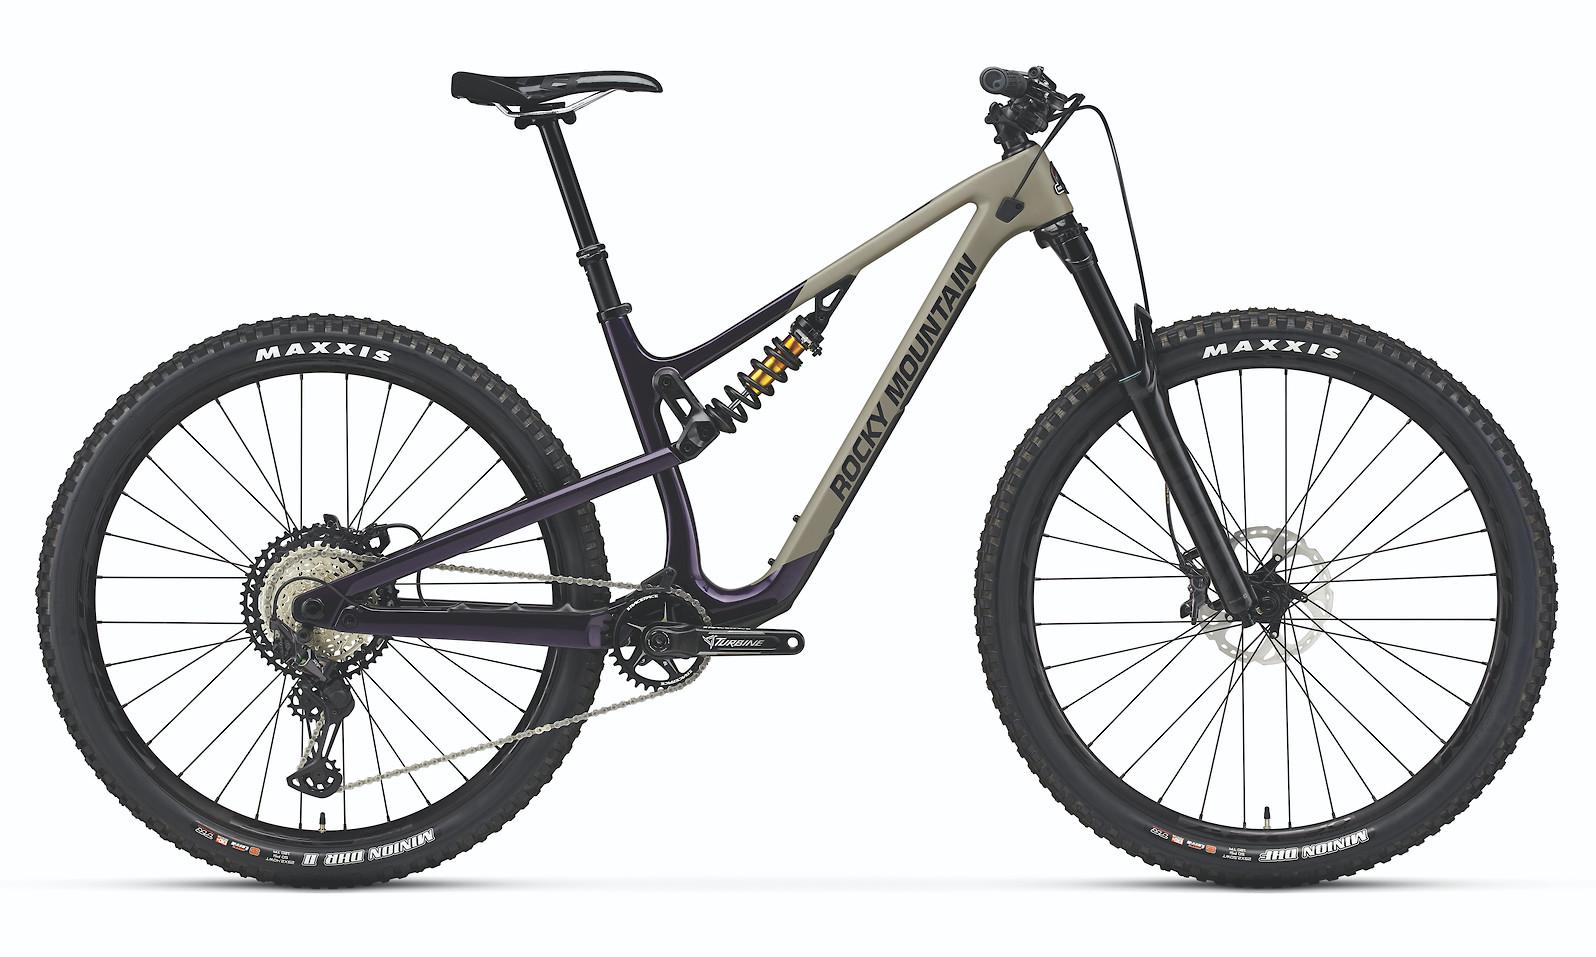 2021 Rocky Mountain Instinct 29 Carbon 70 Coil (Violet Hills/Enter Sandman/Black Dog)